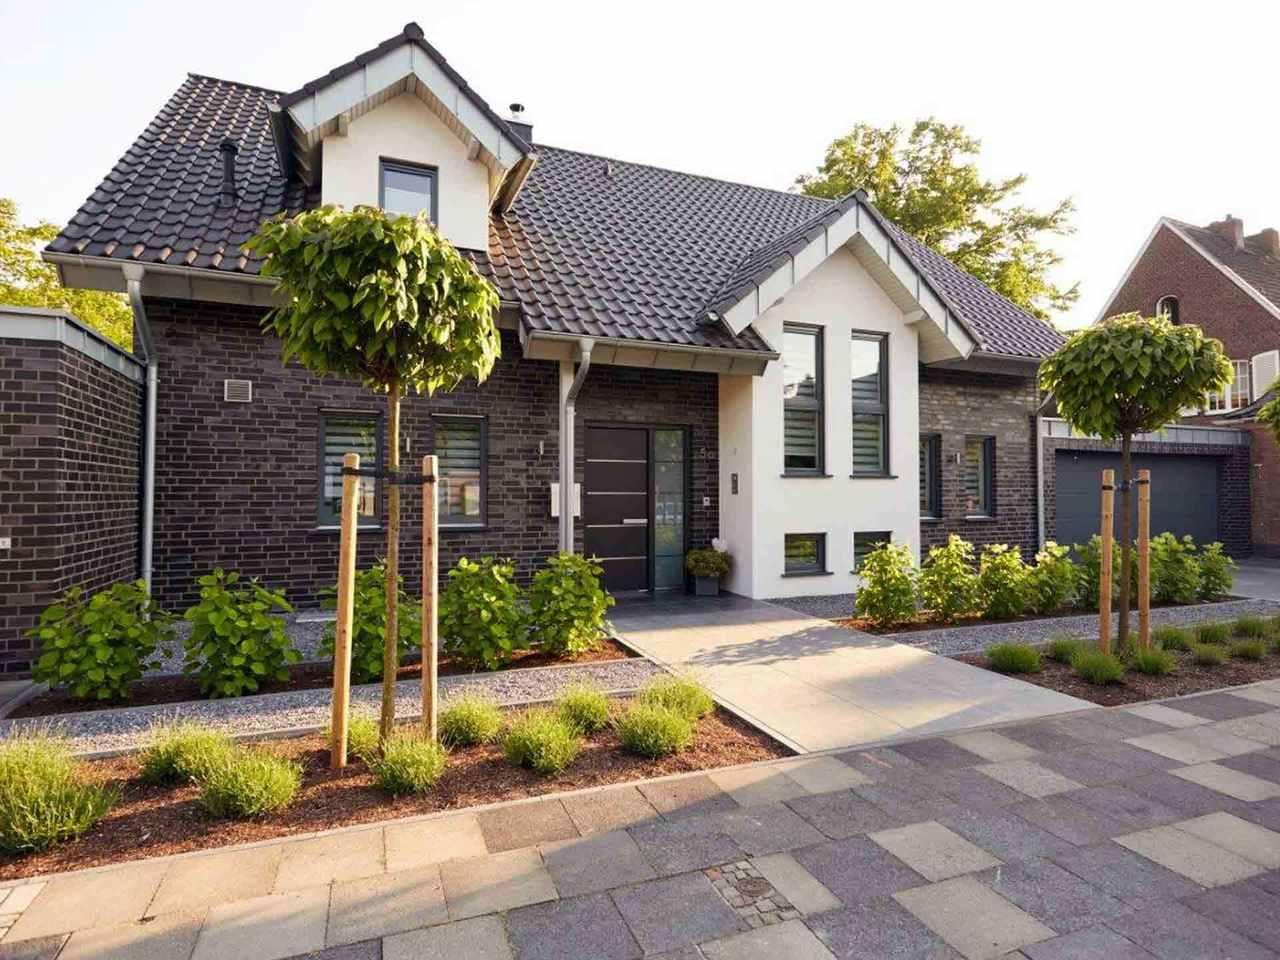 Einfamilienhaus Vahrenheide - GUSSEK HAUS